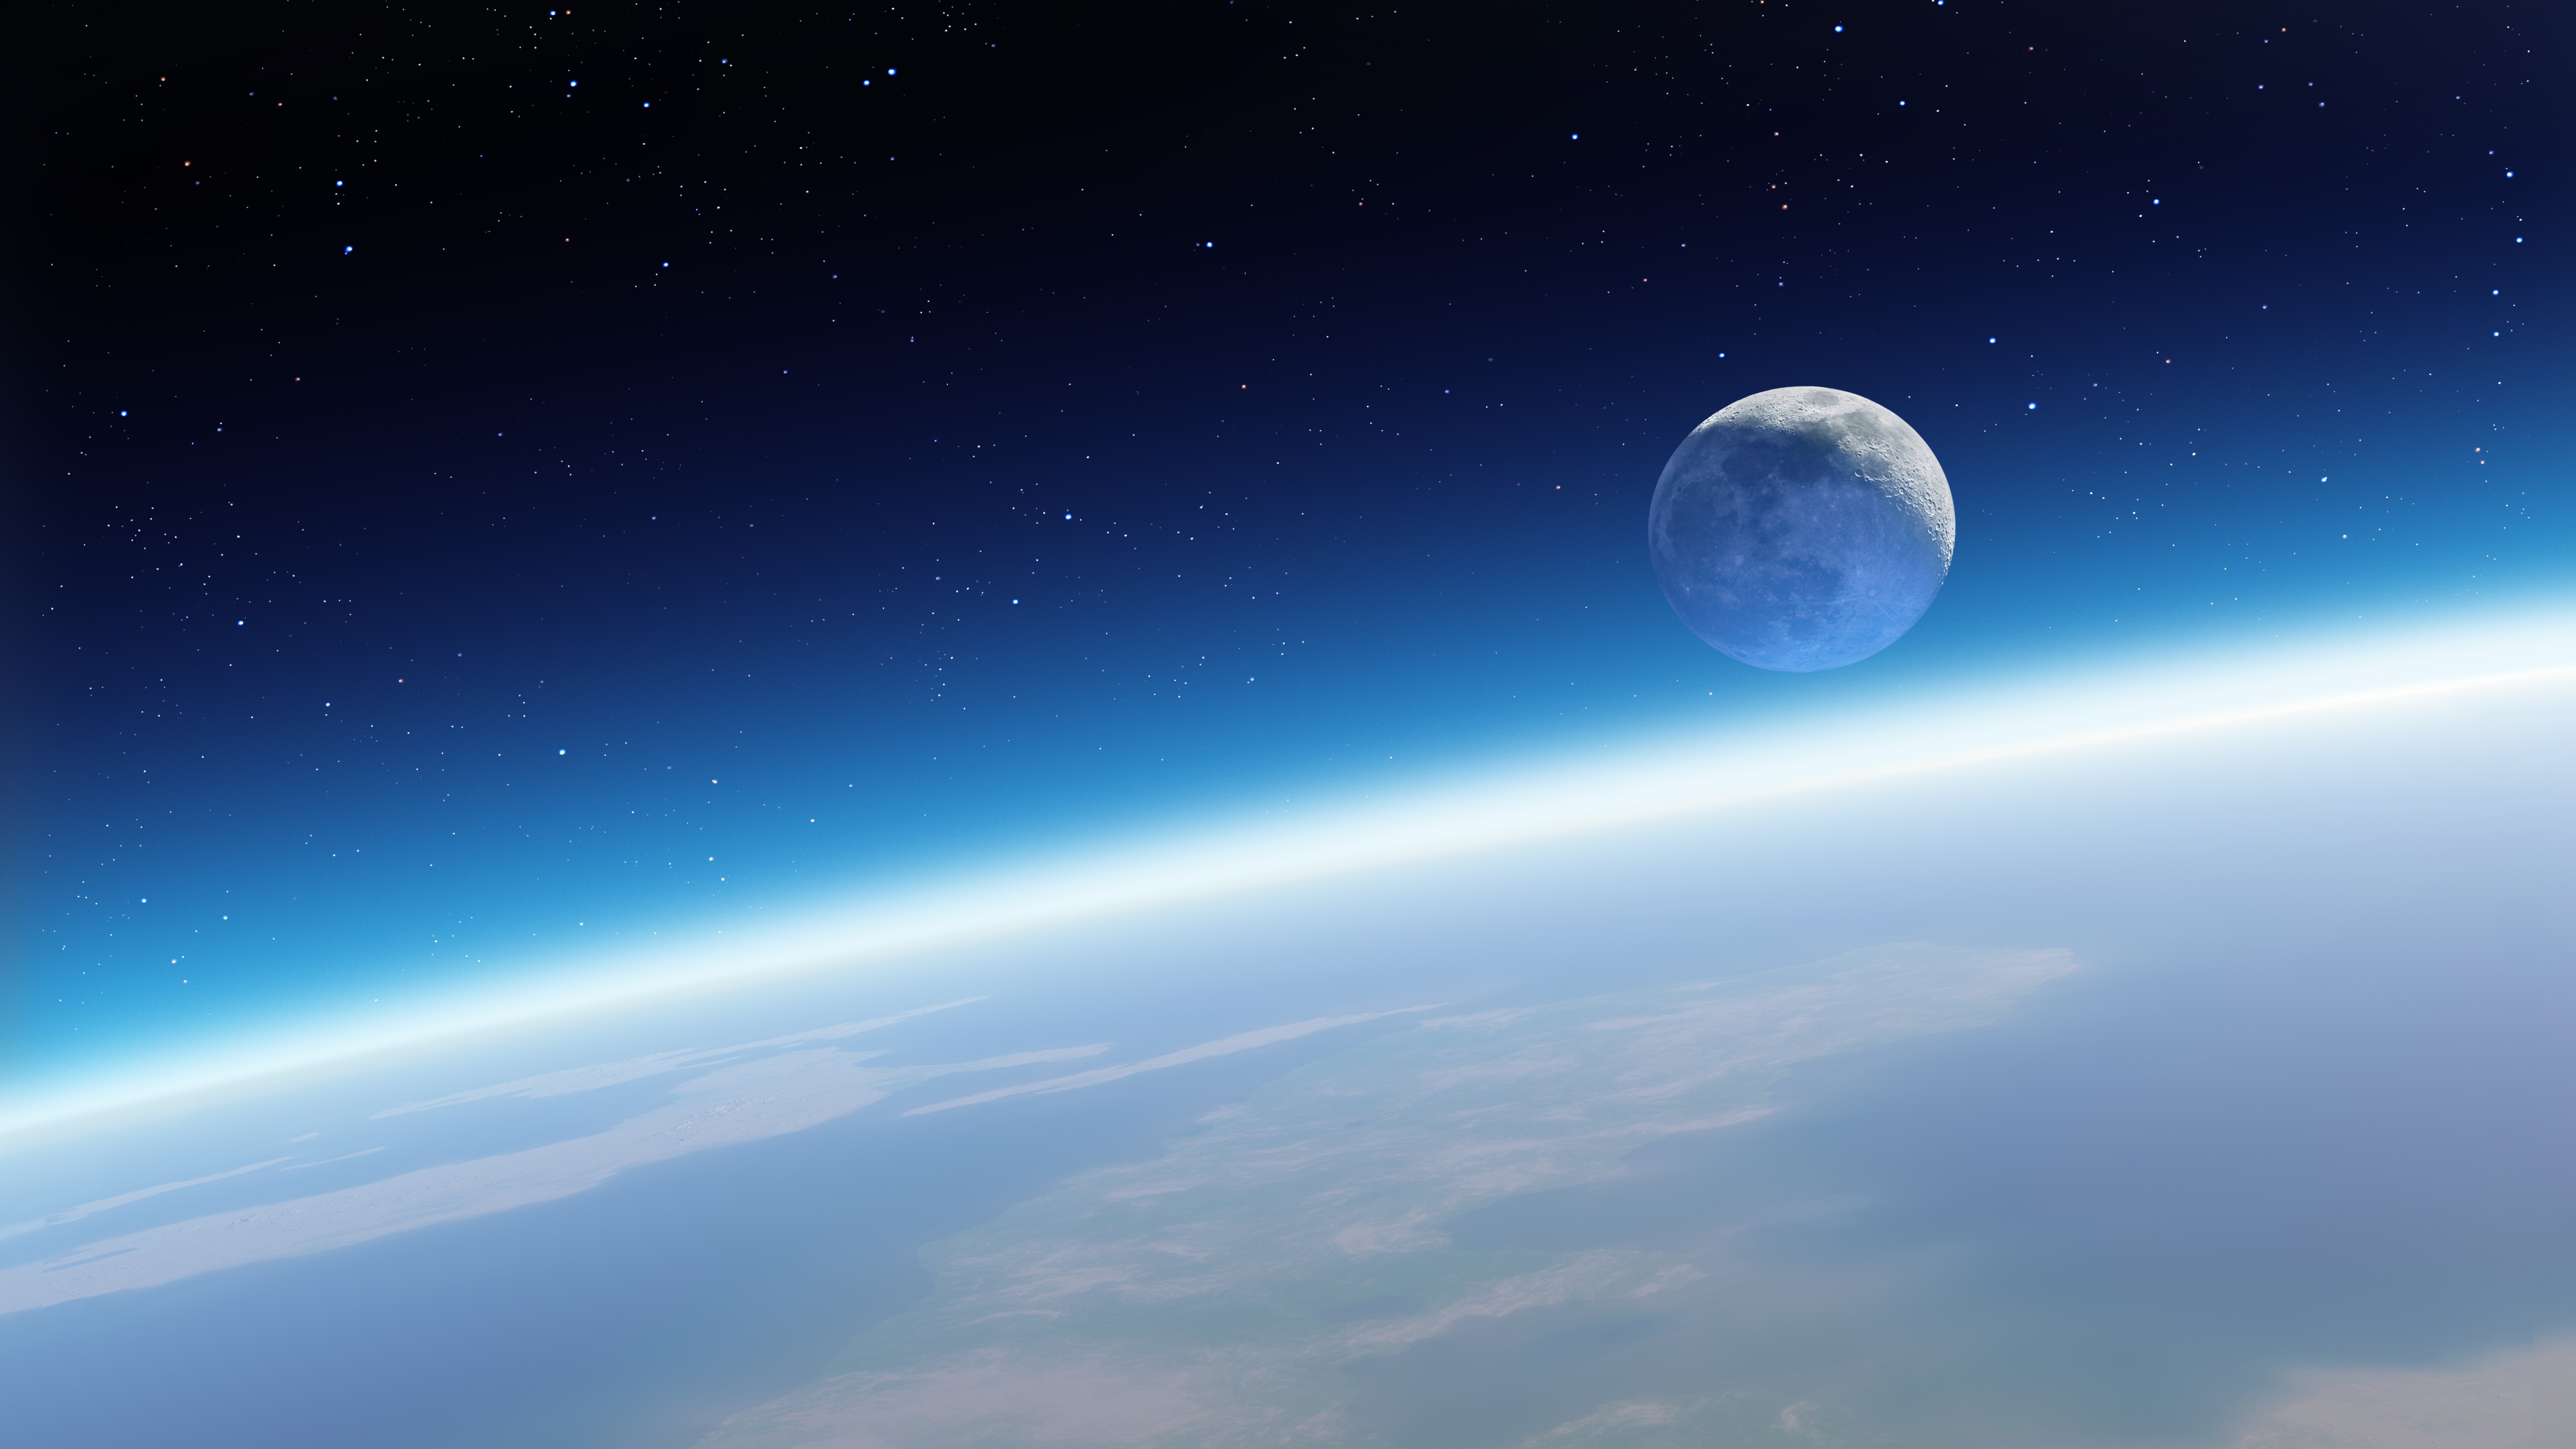 Fantastic Wallpaper Macbook Star Wars - earth-and-moon  Snapshot_173331.jpg?ssl\u003d1